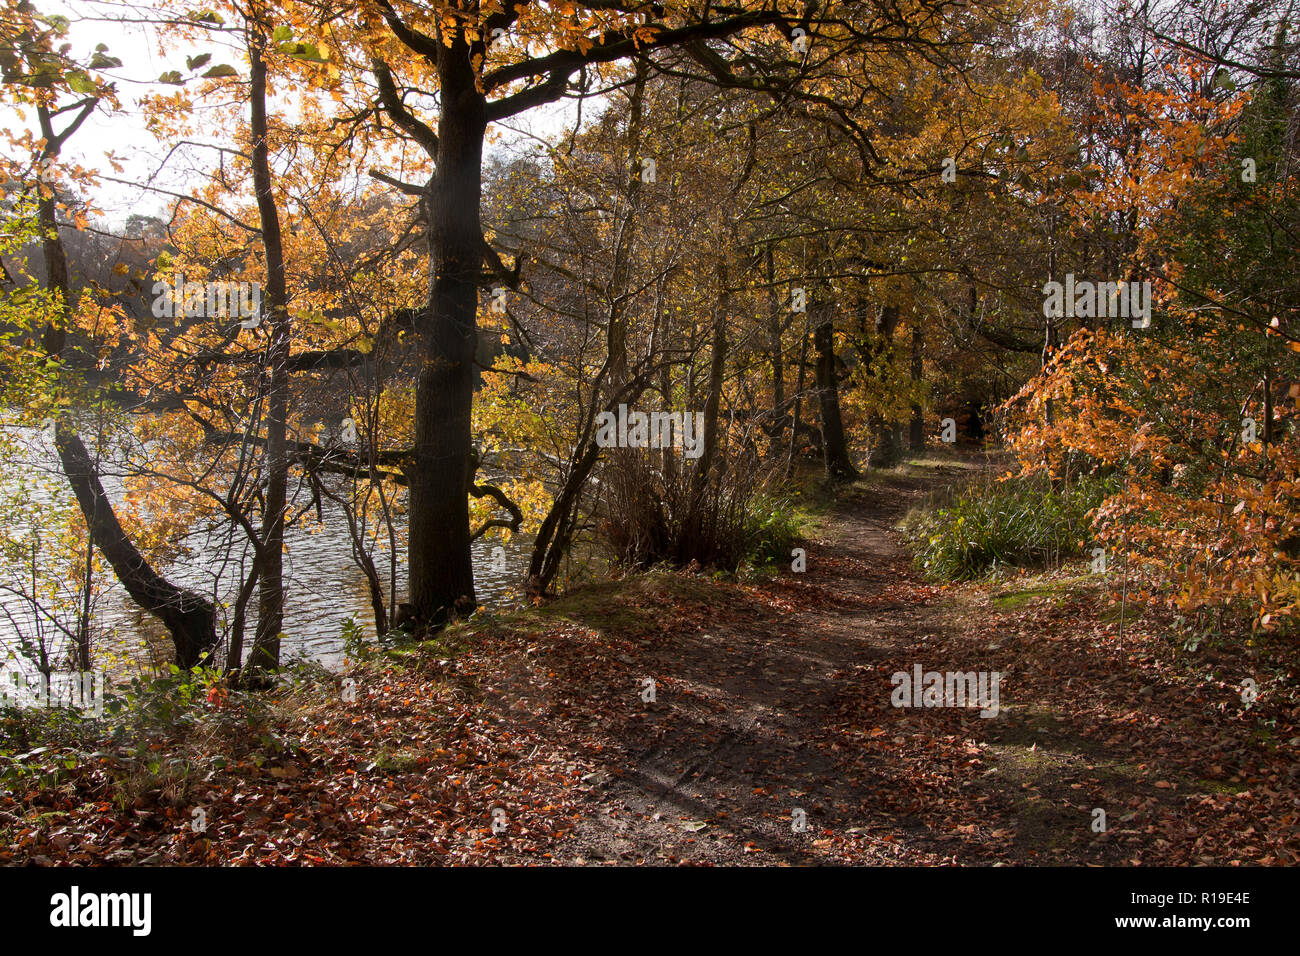 autumn, the Tarn, Puttenham, nr Godalming & Guildford, Surrey, England - Stock Image